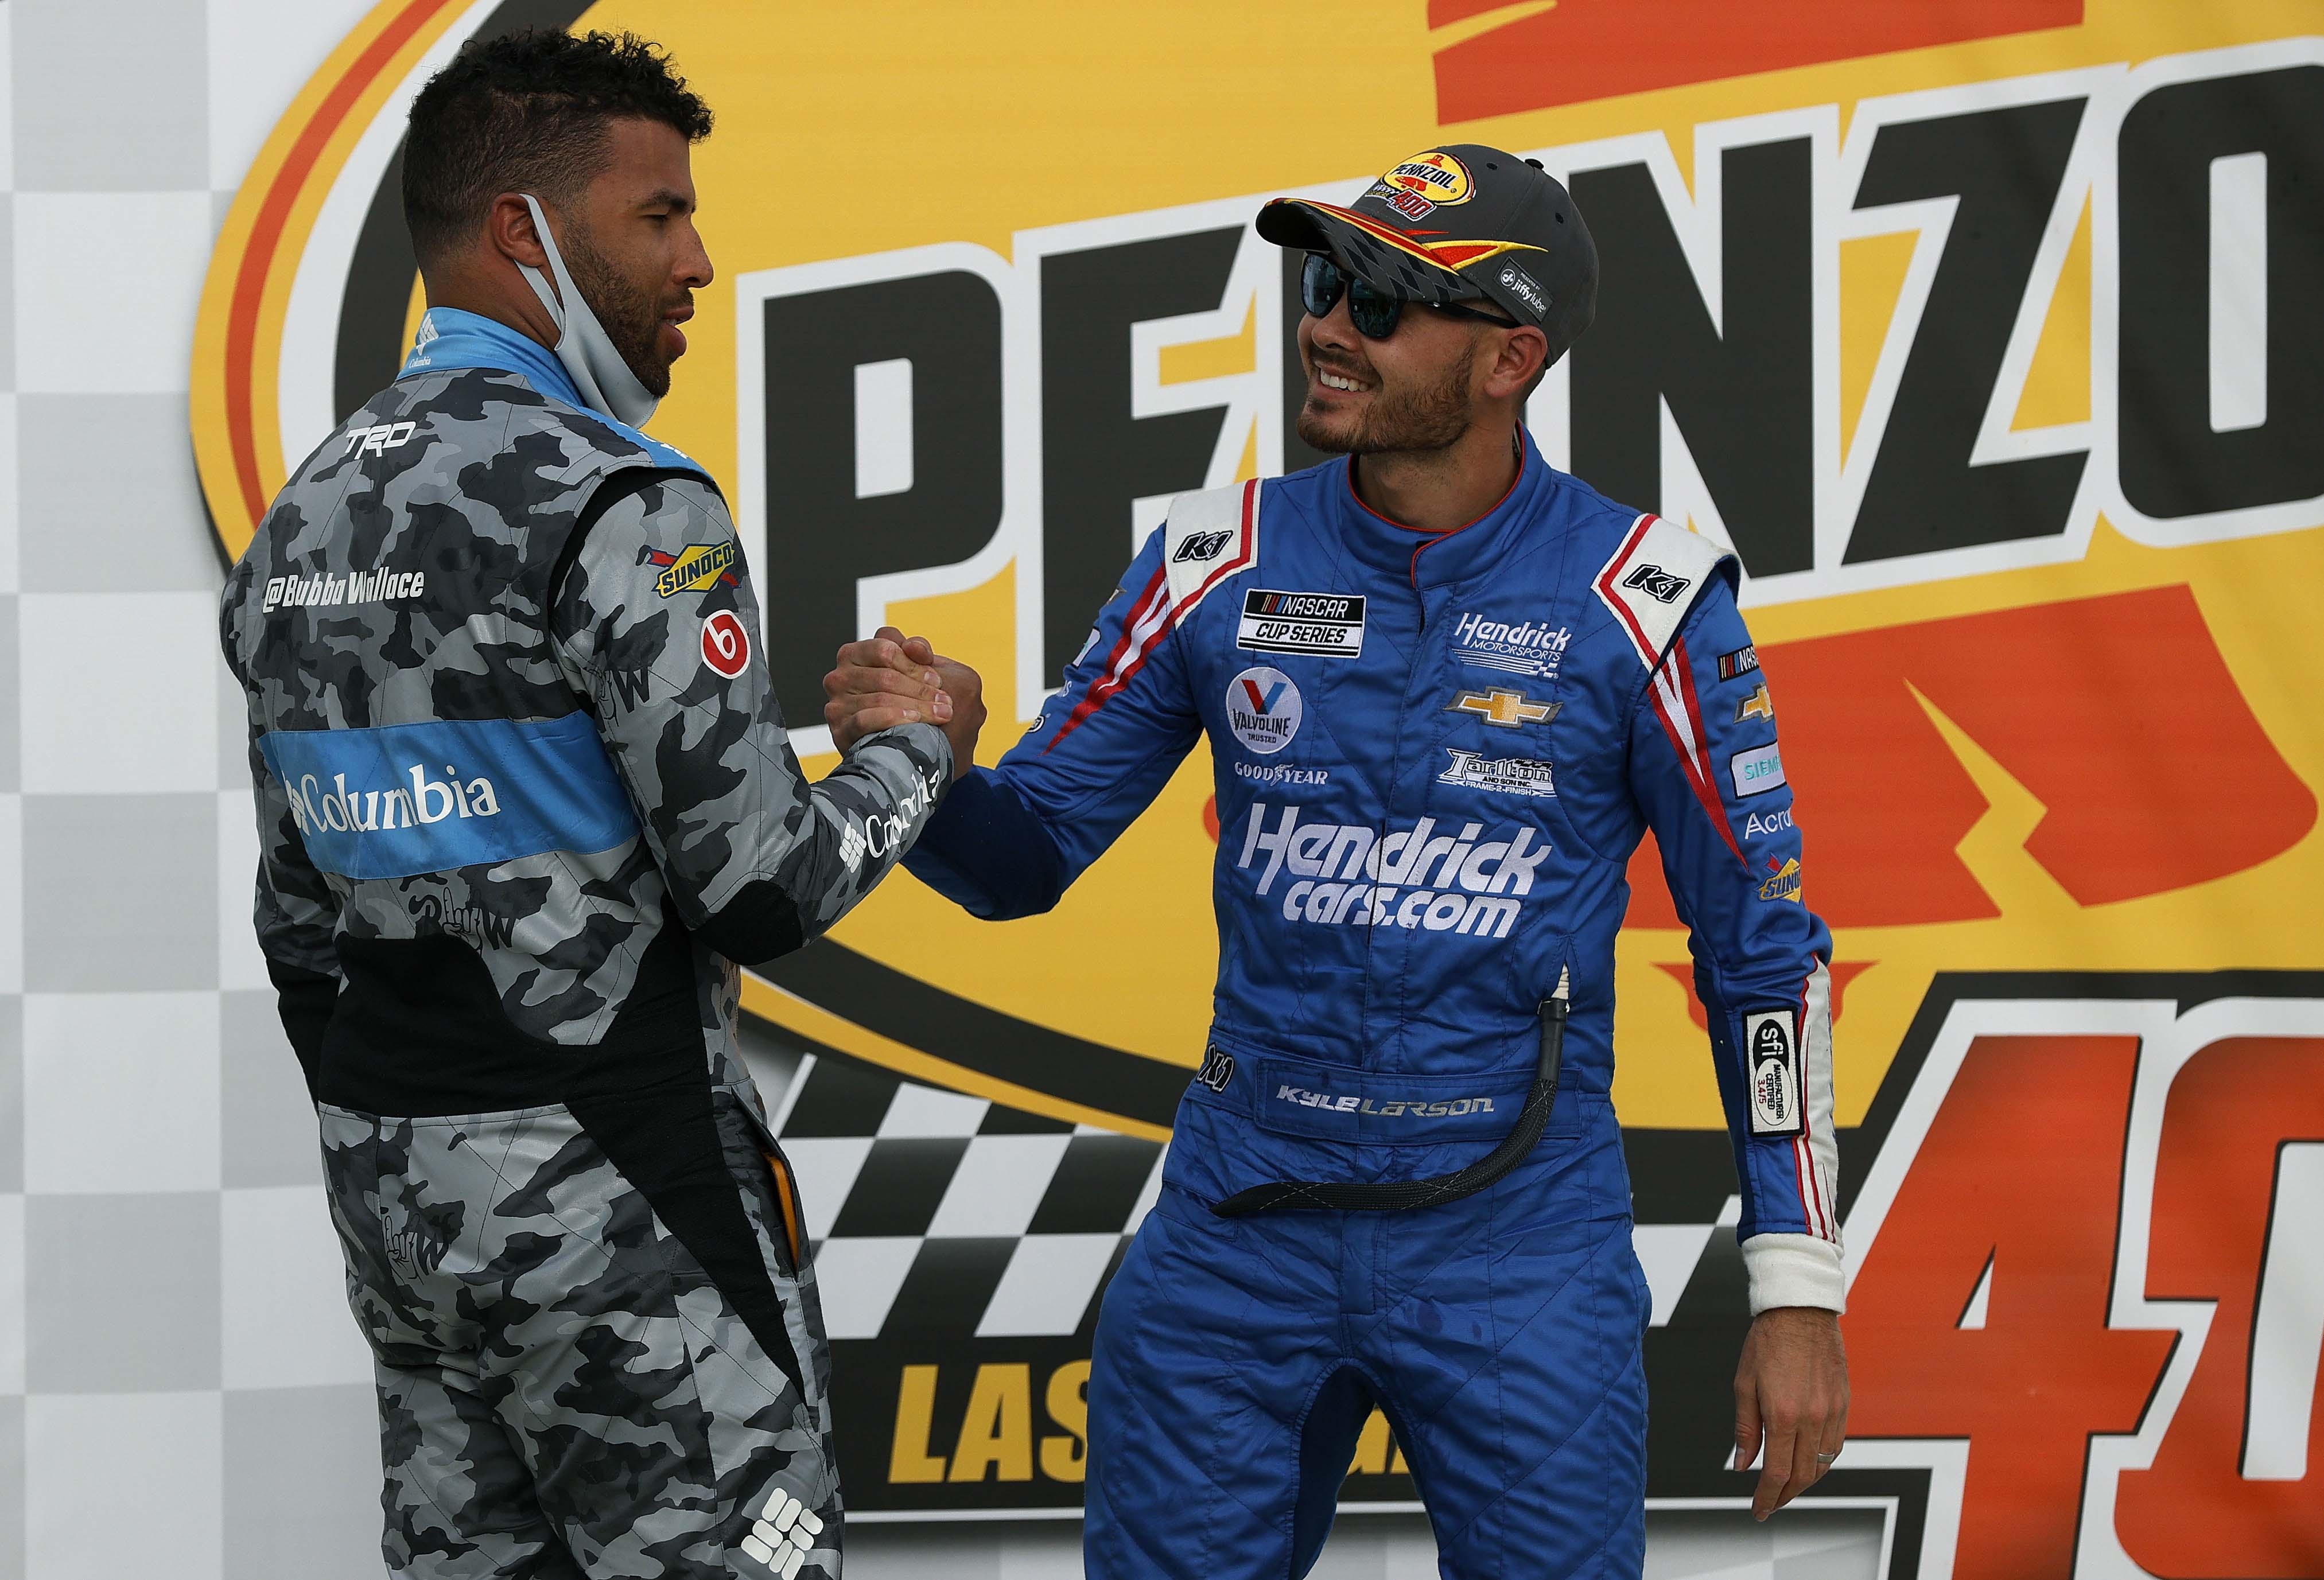 Bubba Wallace congrats Kyle Larson in victory lane at Las Vegas Motor Speedway - NASCAR Cup Series